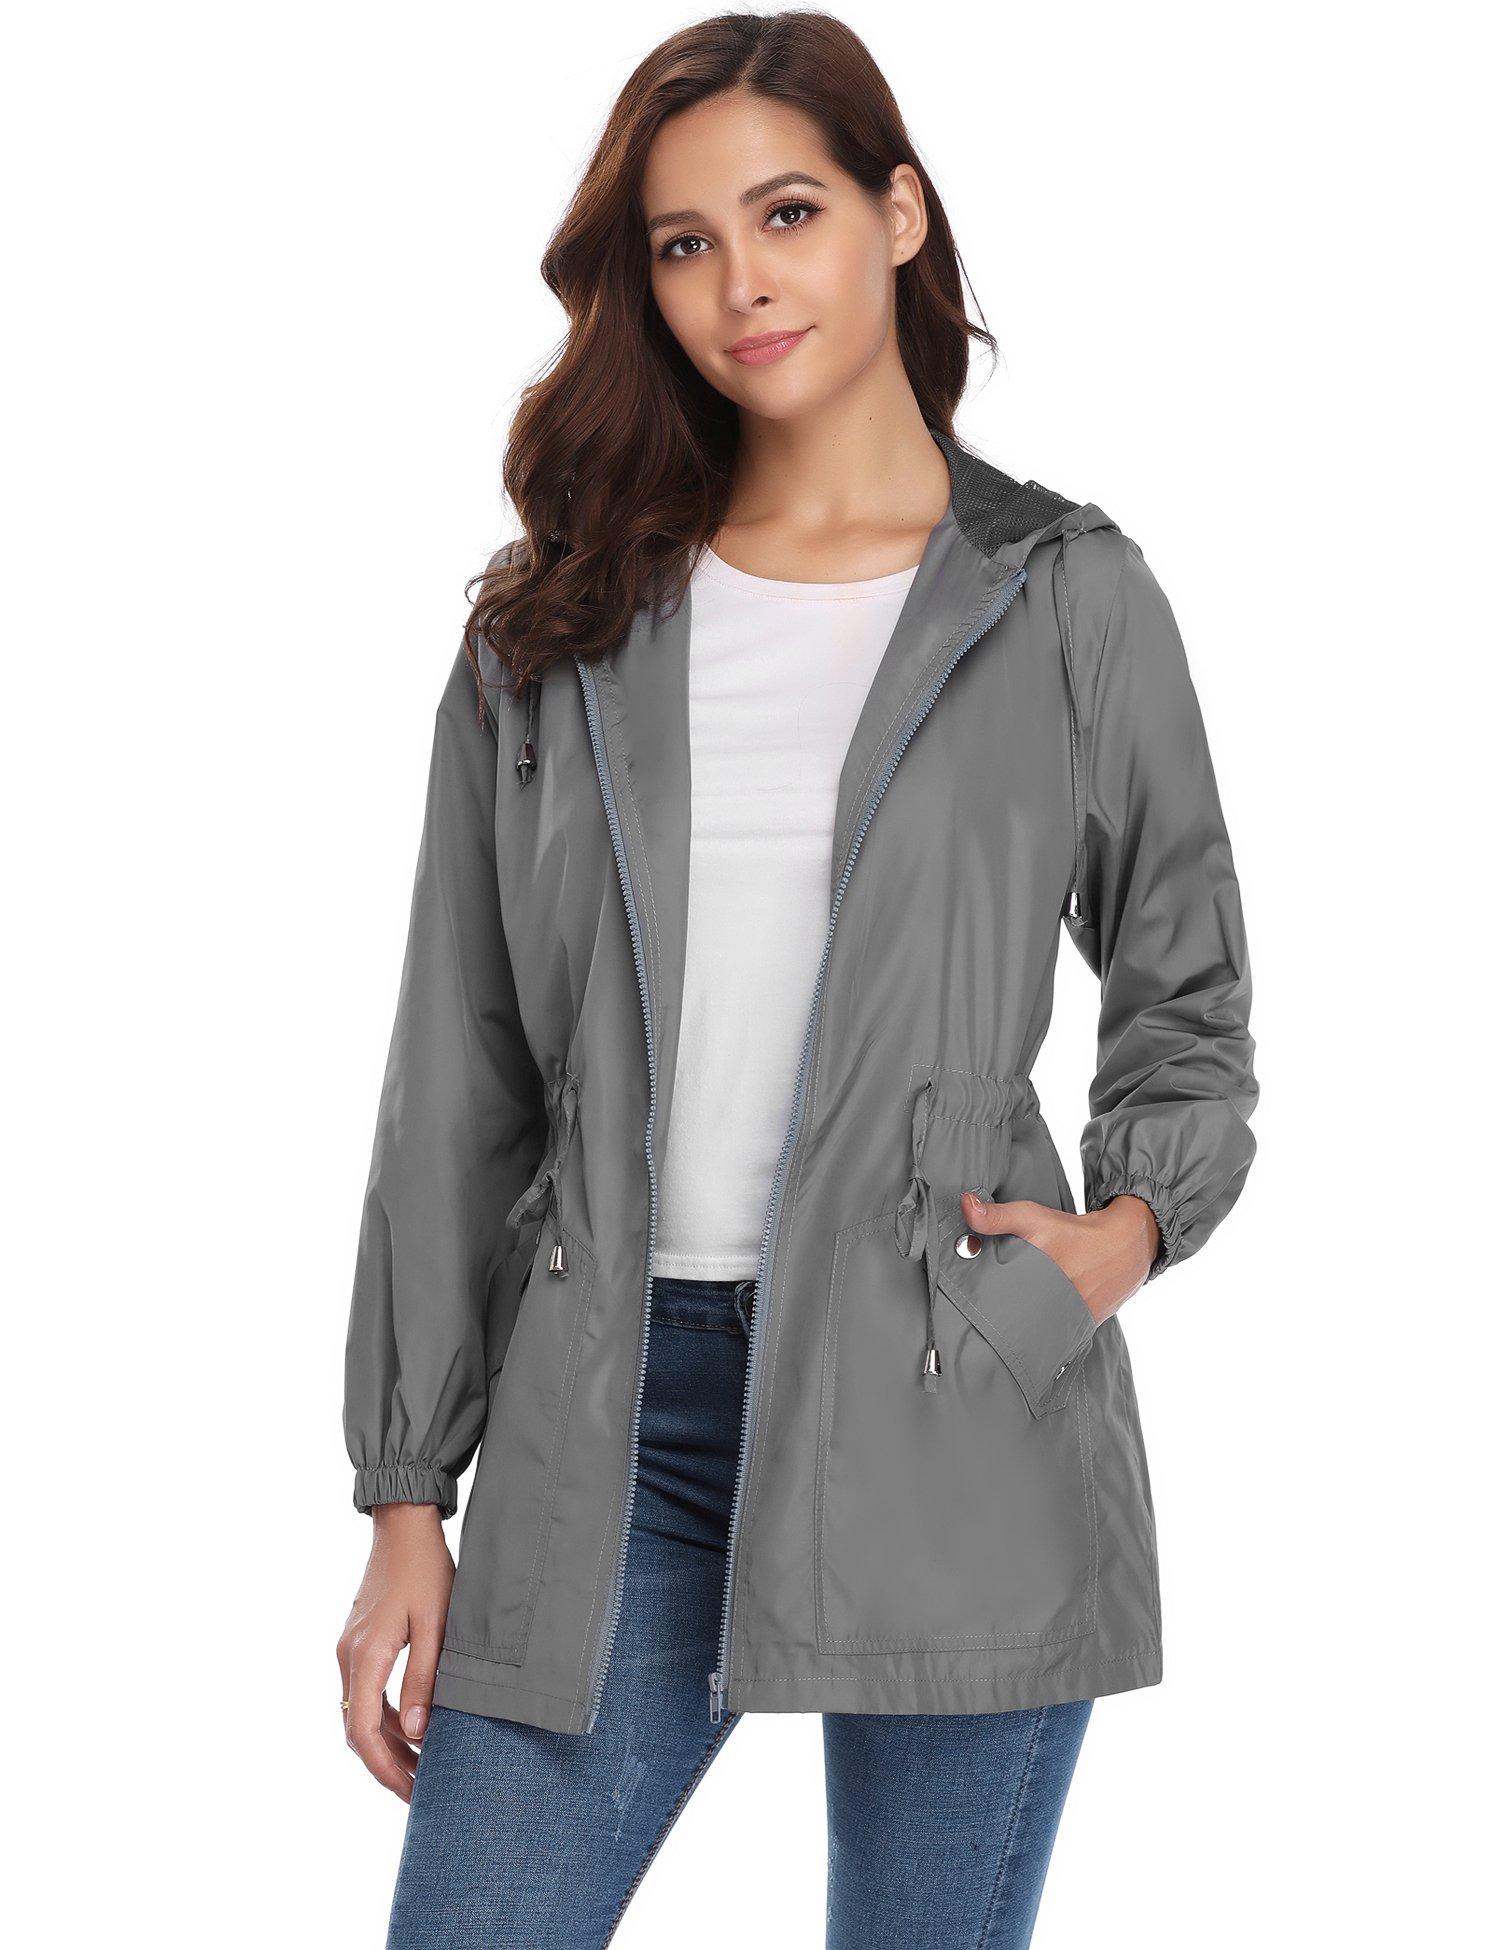 iClosam Women Rain Jacket Women Outdoor Hooded Waterproof Lightweight Raincoat Windbreaker